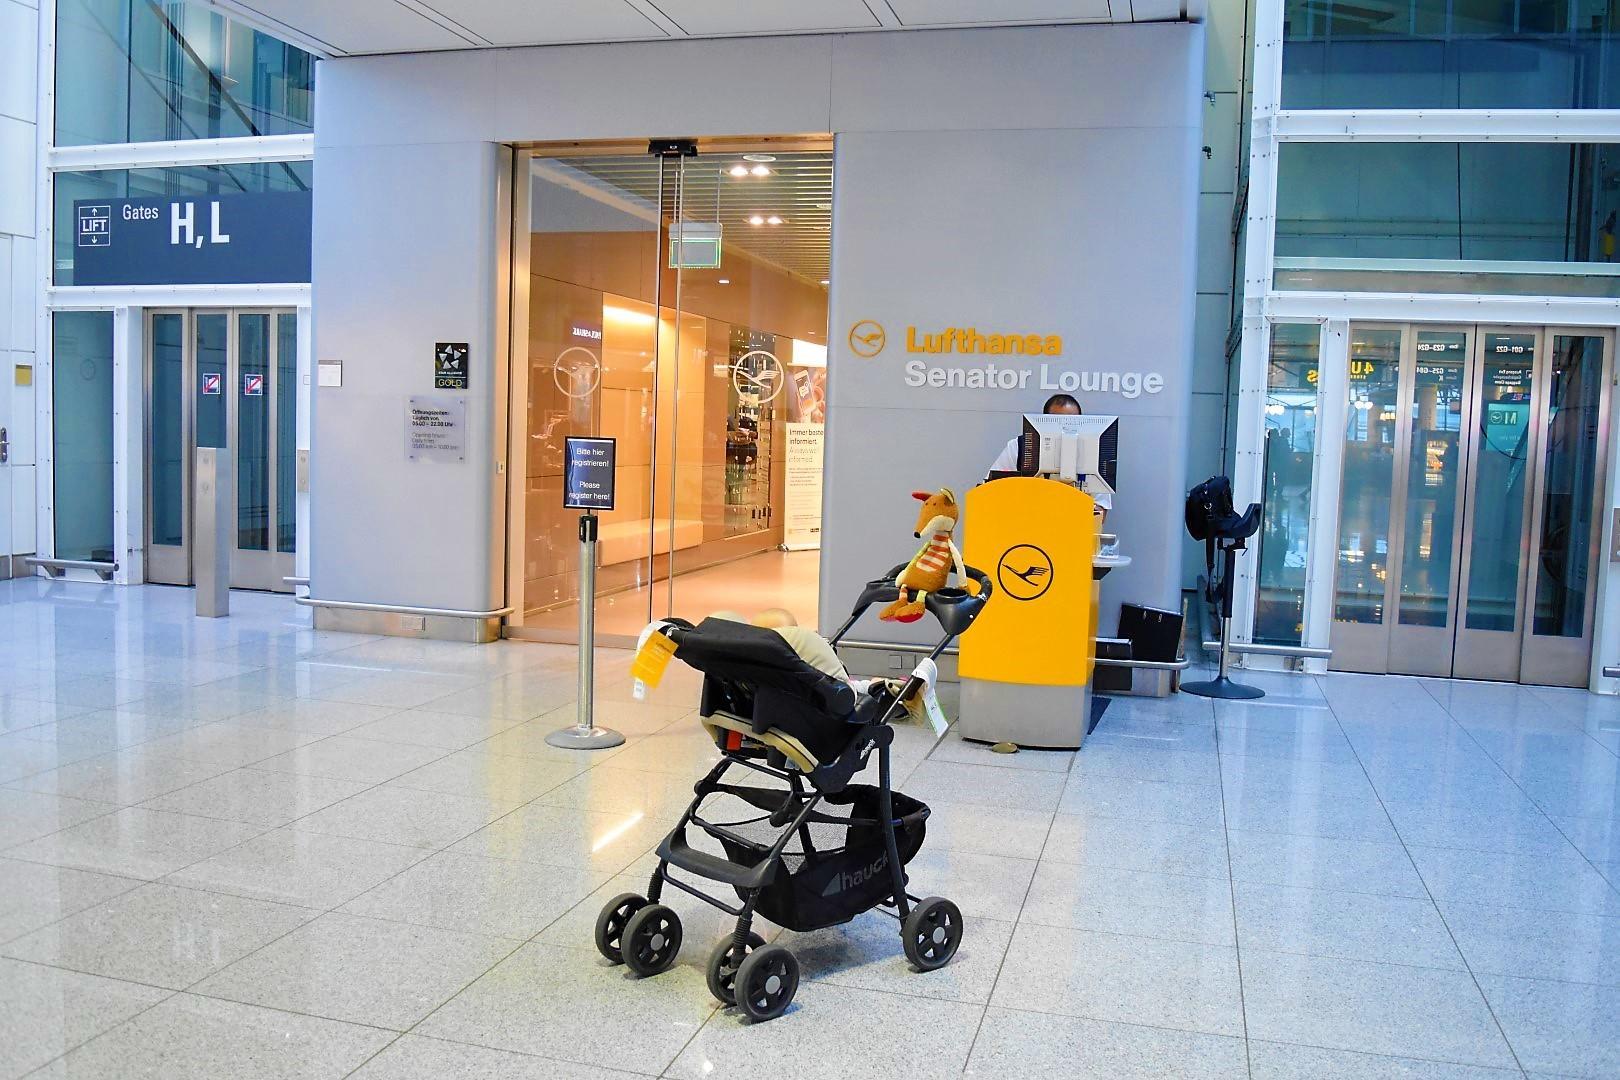 Eingang Lufthansa Senator Lounge MUC Terminal 2 Schengen Gate G